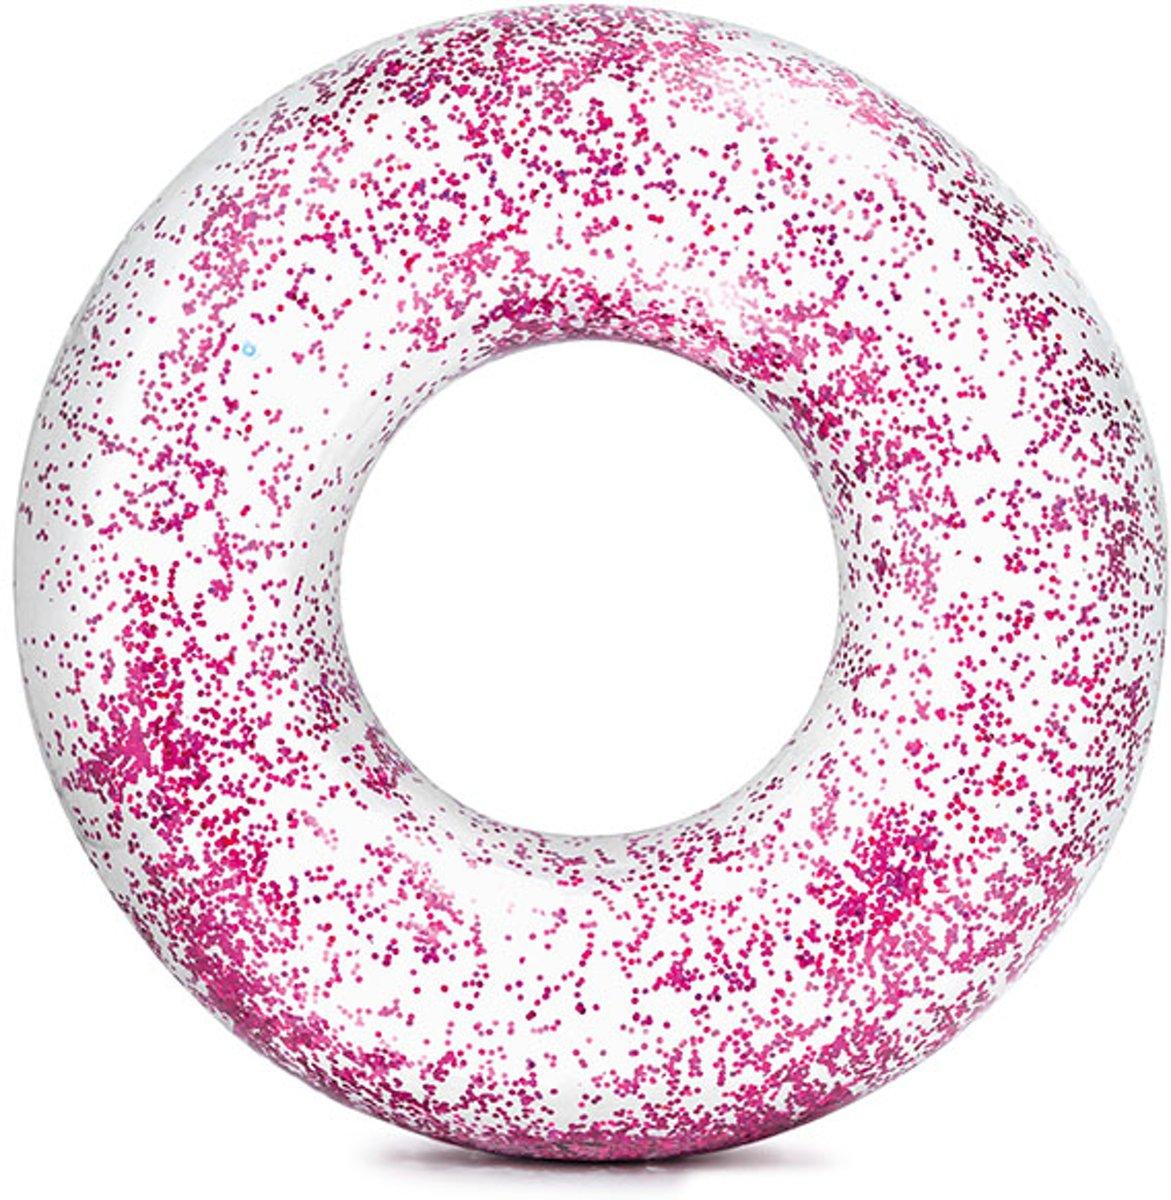 Intex Zwemring Glitter 119cm Roze